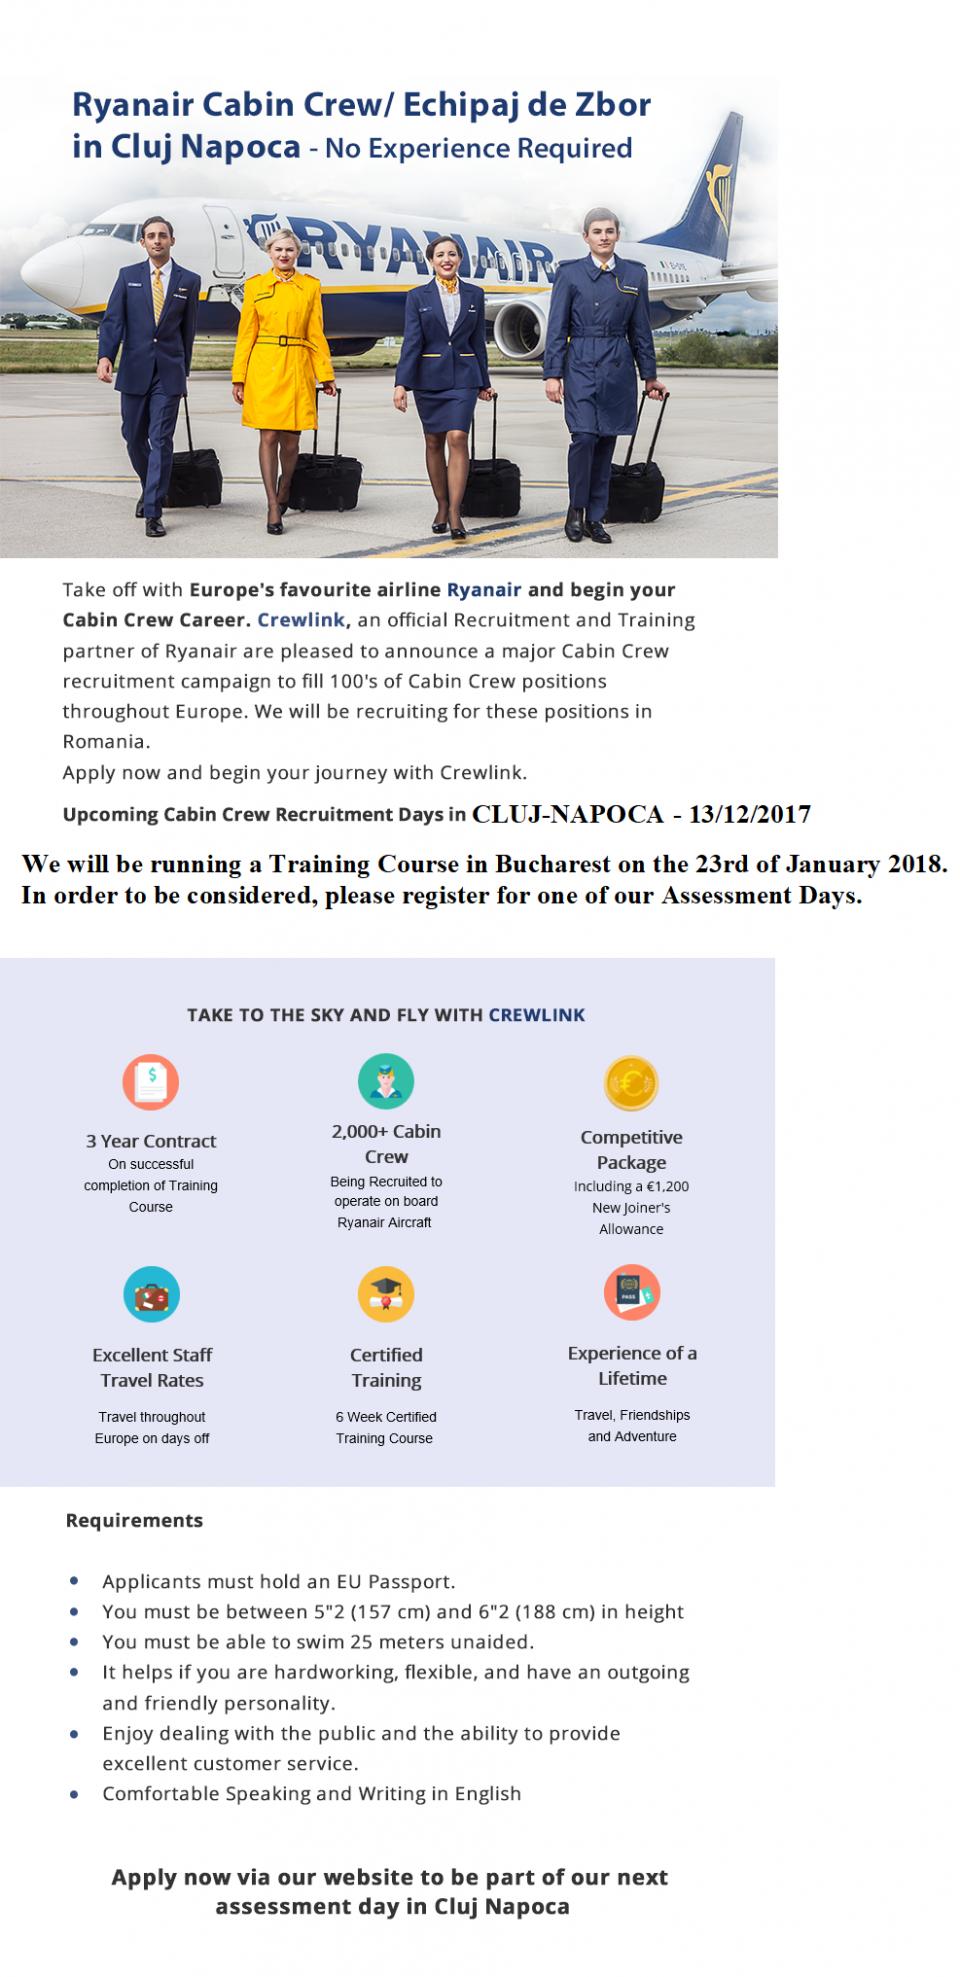 Ryanair Cabin Crew - No Experience Required - CLUJ NAPOCA